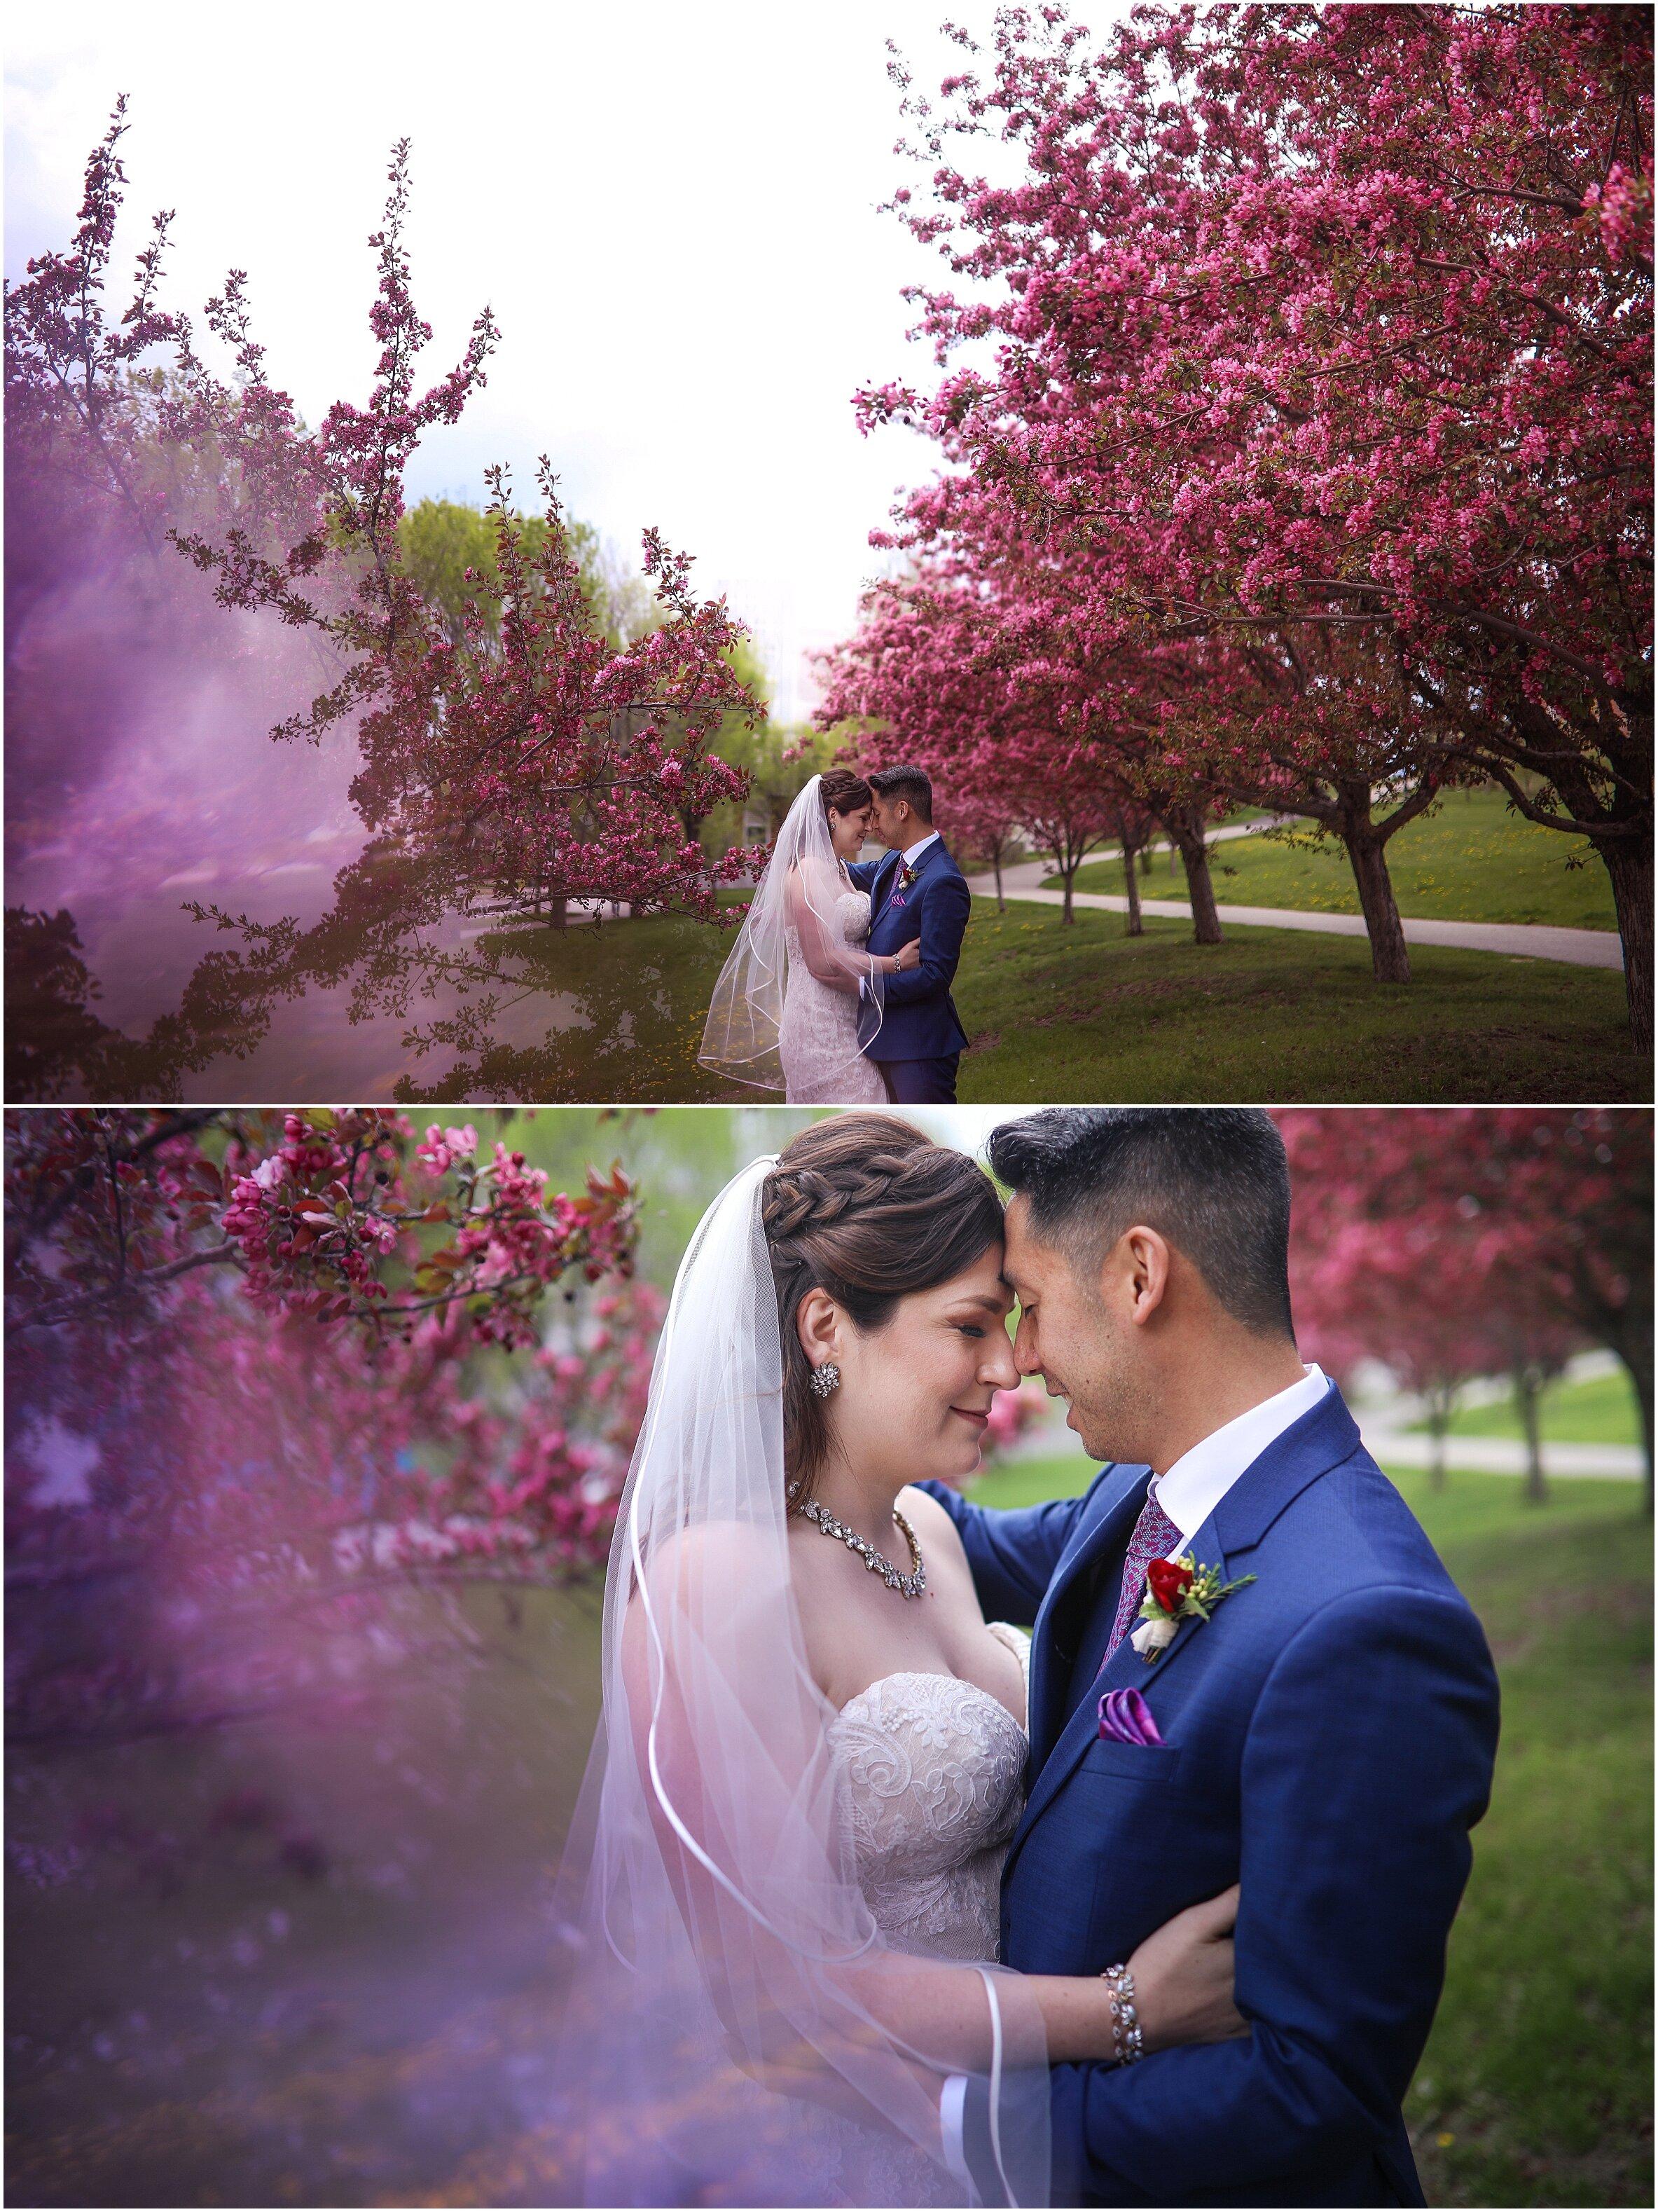 vancouver-wedding-photographer-the-loft-earls-yaletown_0121.jpg